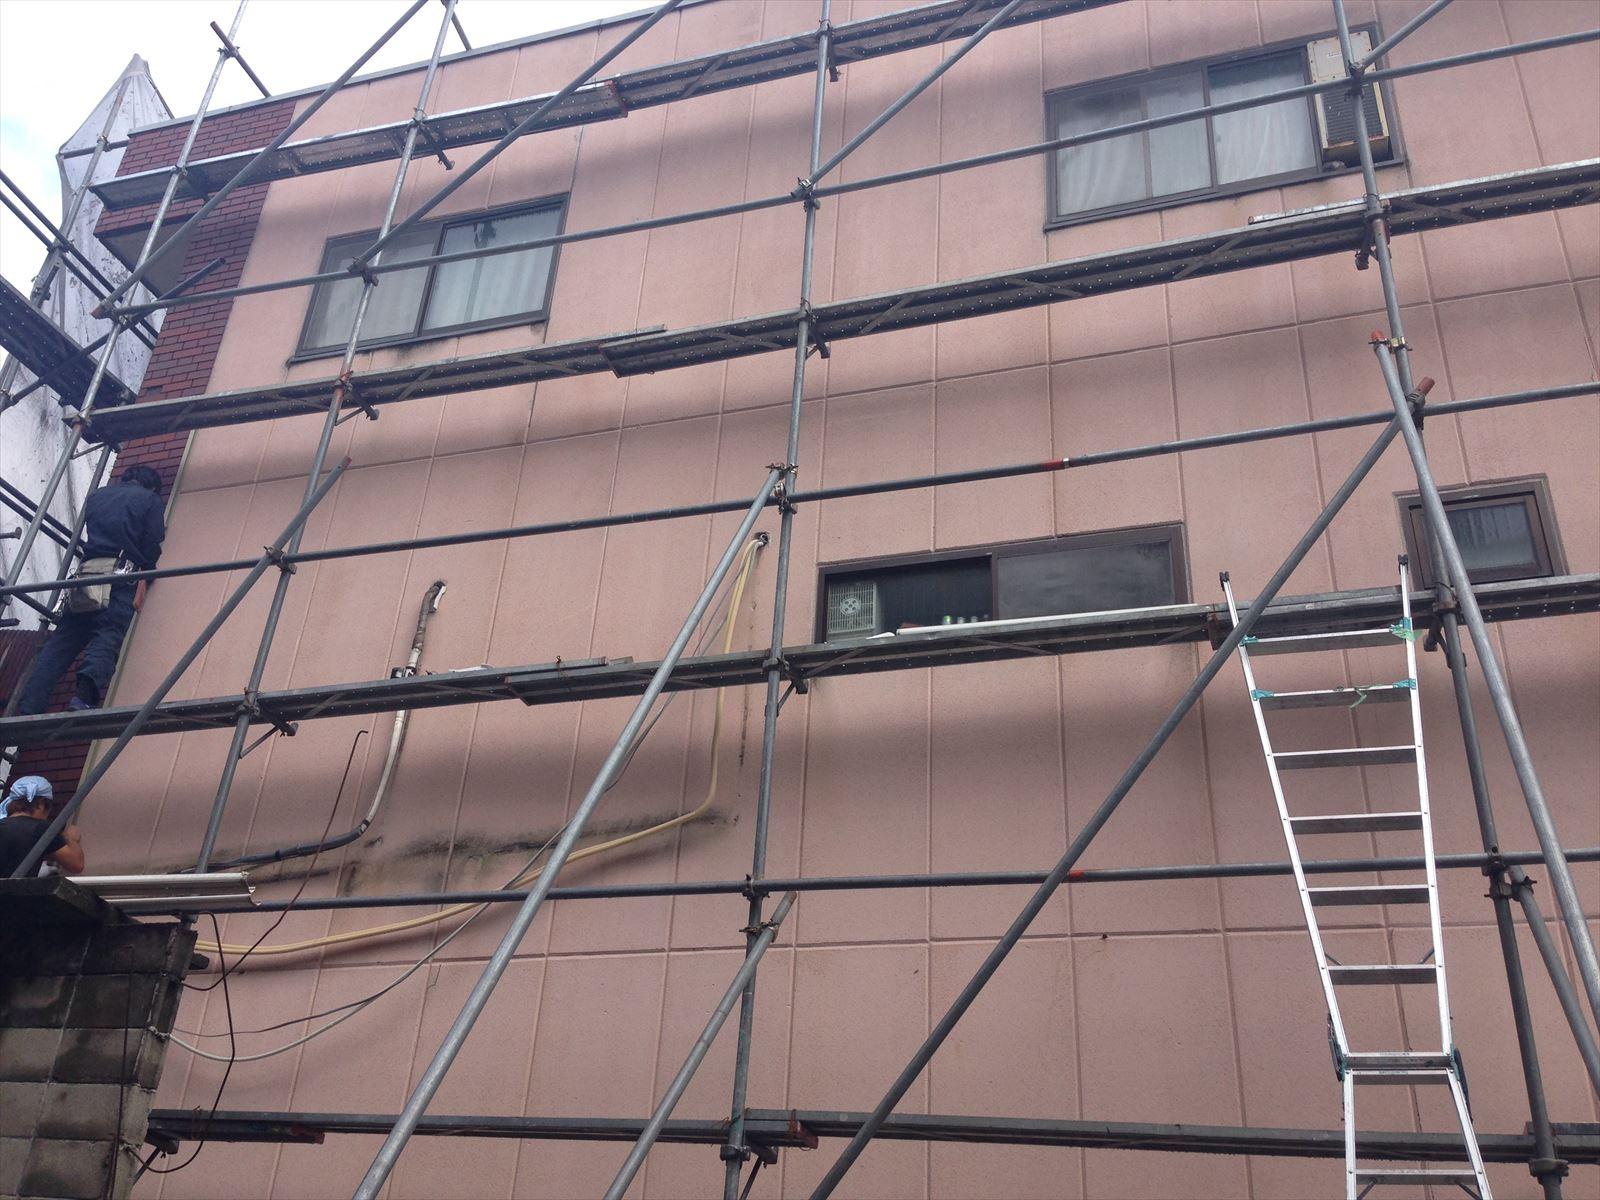 下京区守野様邸外壁・屋根塗り工事の施工前写真その2